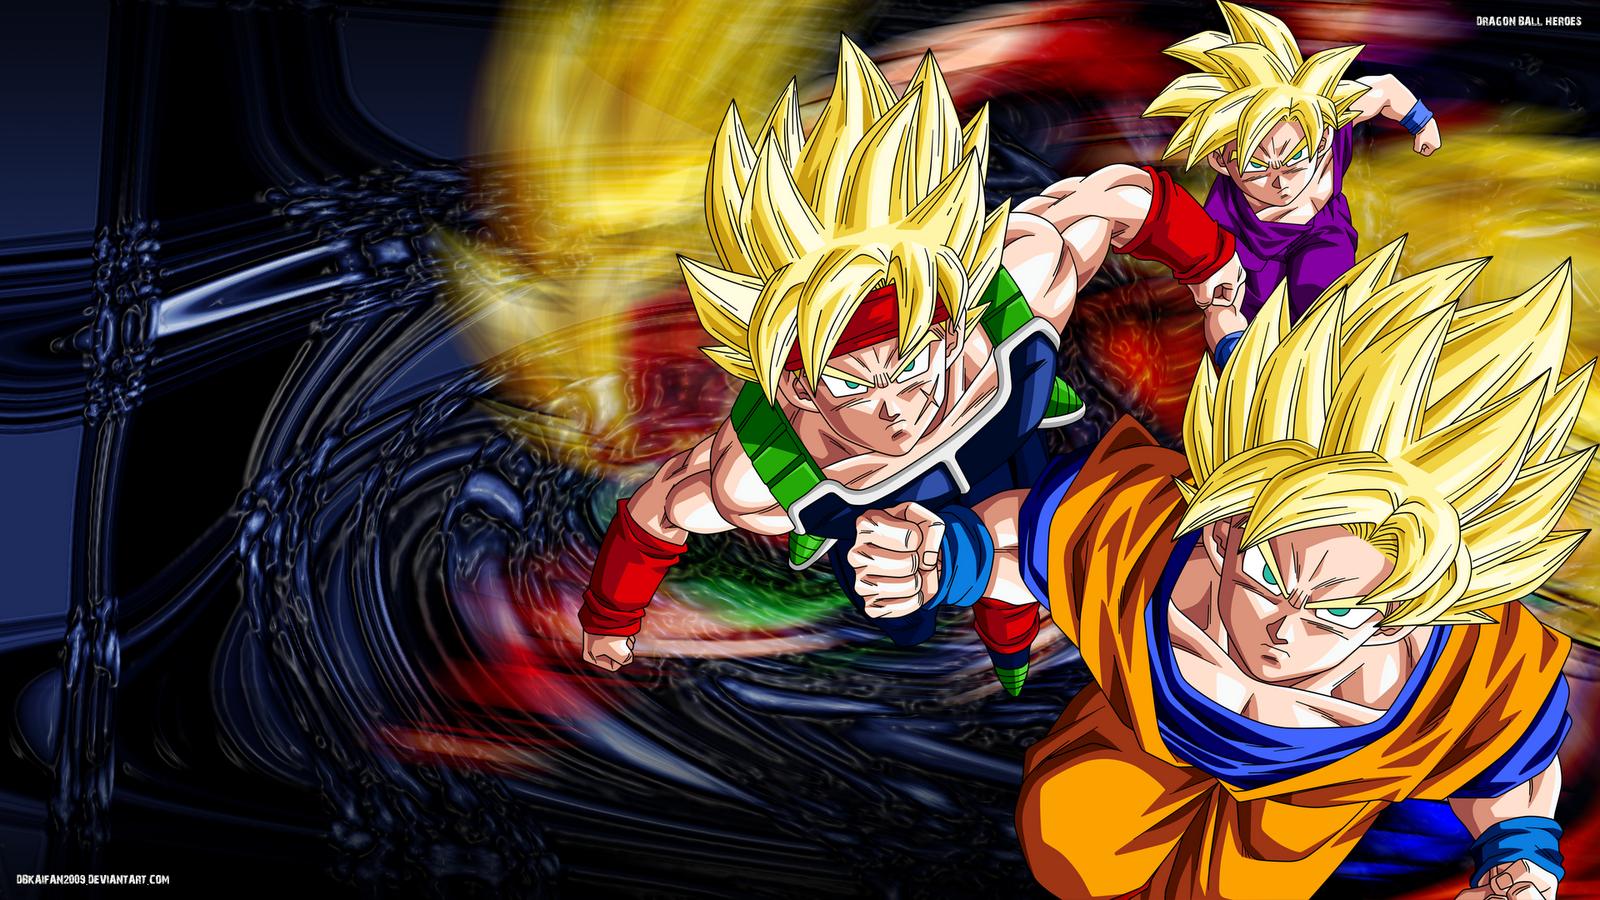 Dbz 1080p Wallpaper Best Dbz Quotes Dragon Ball Online Wallpapers Bimages Net Free Full